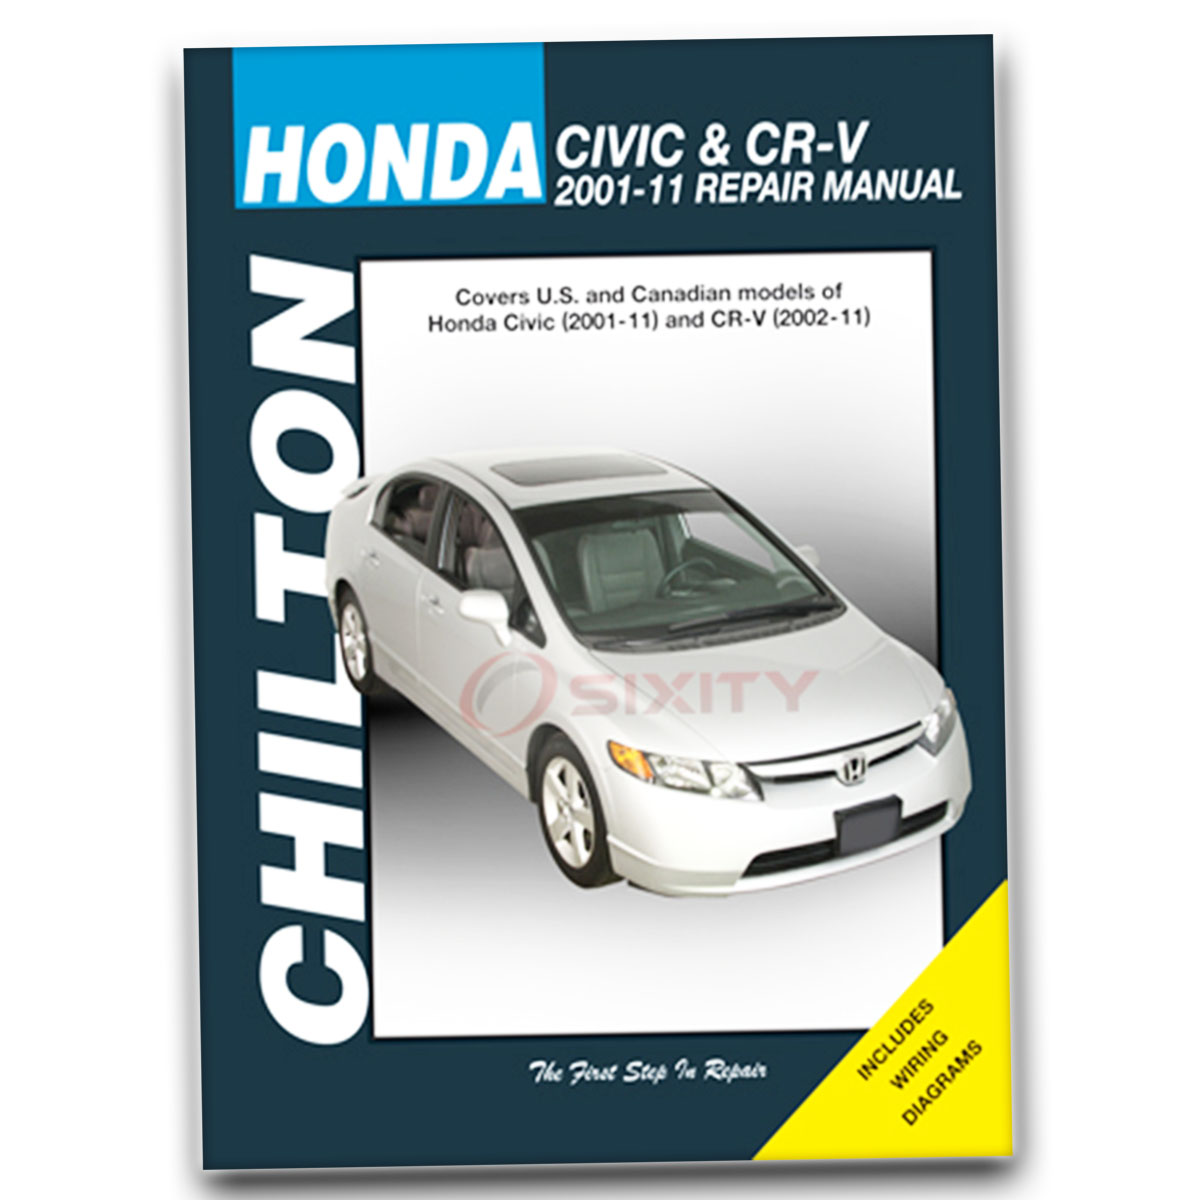 Honda civic chilton repair manual hx mugen si dx lx hybrid gx